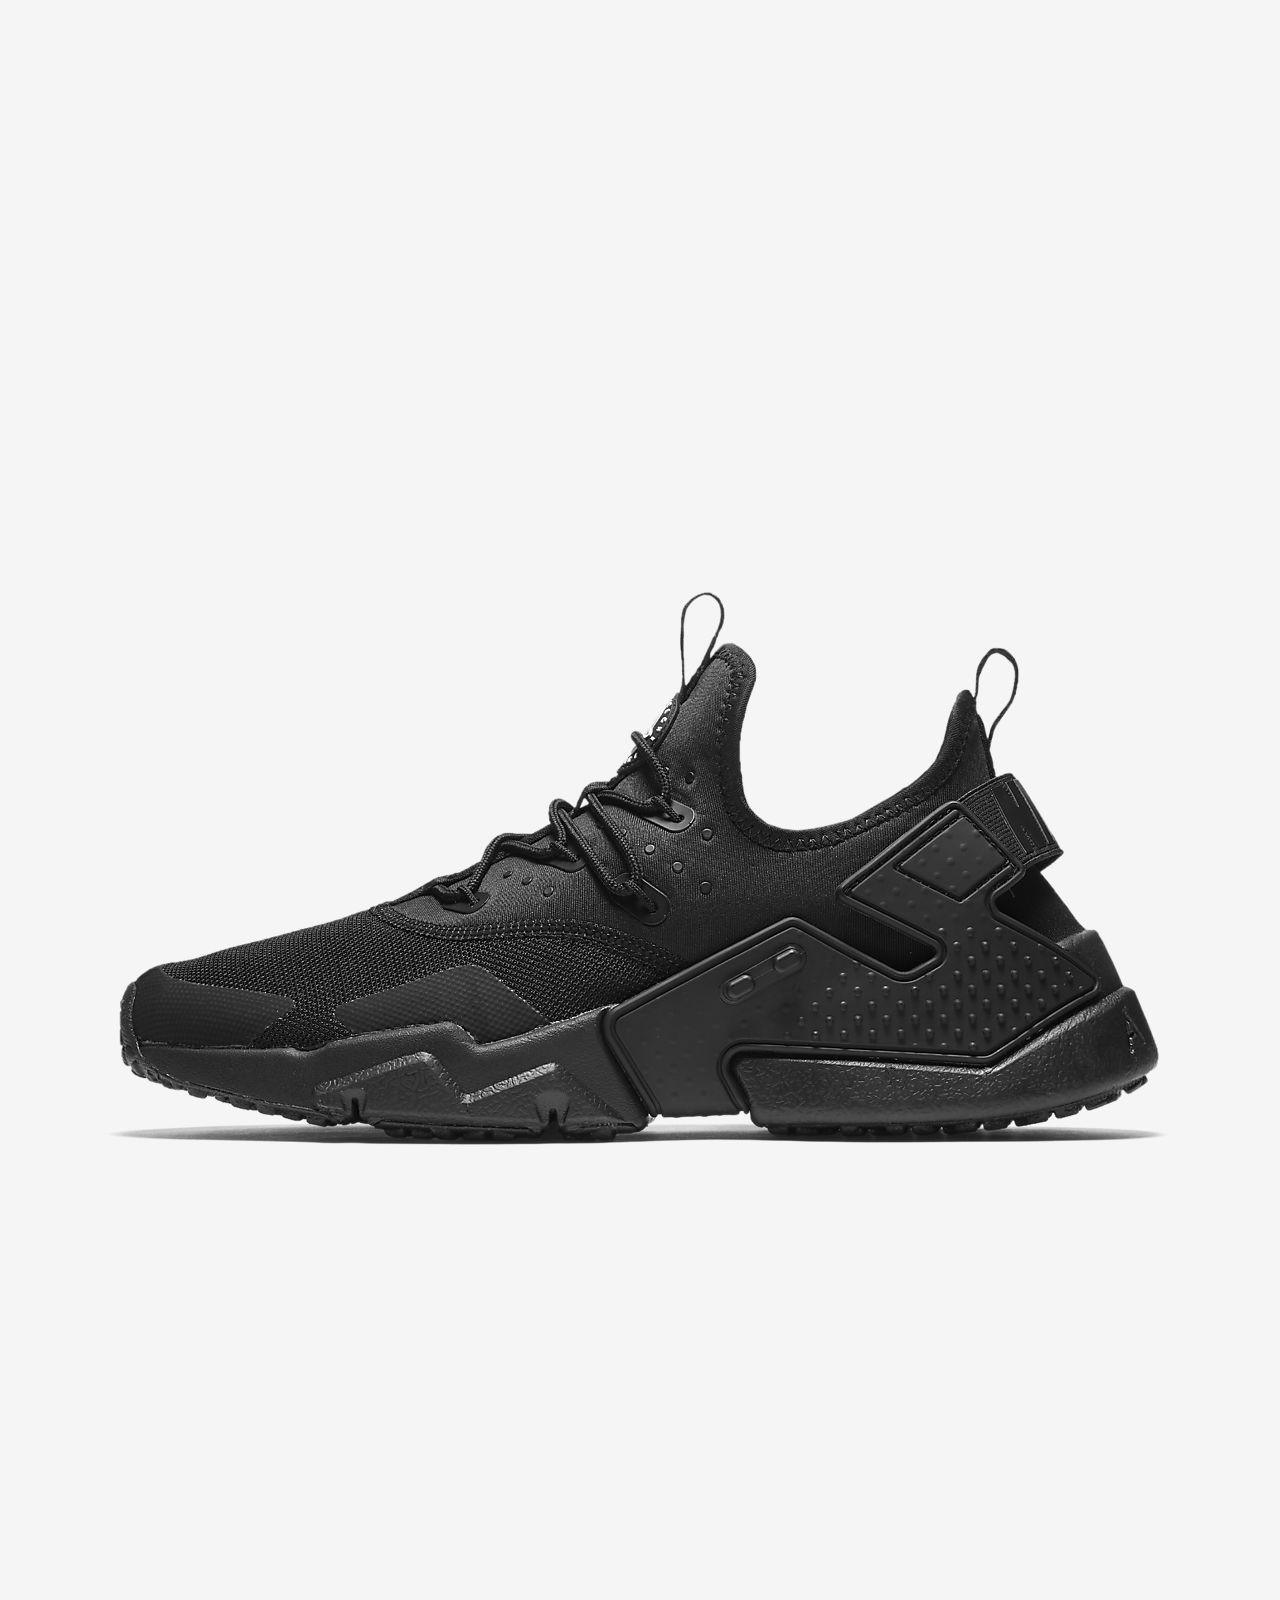 61eb113802067 Nike Air Huarache Drift Men s Shoe - 6 in 2019